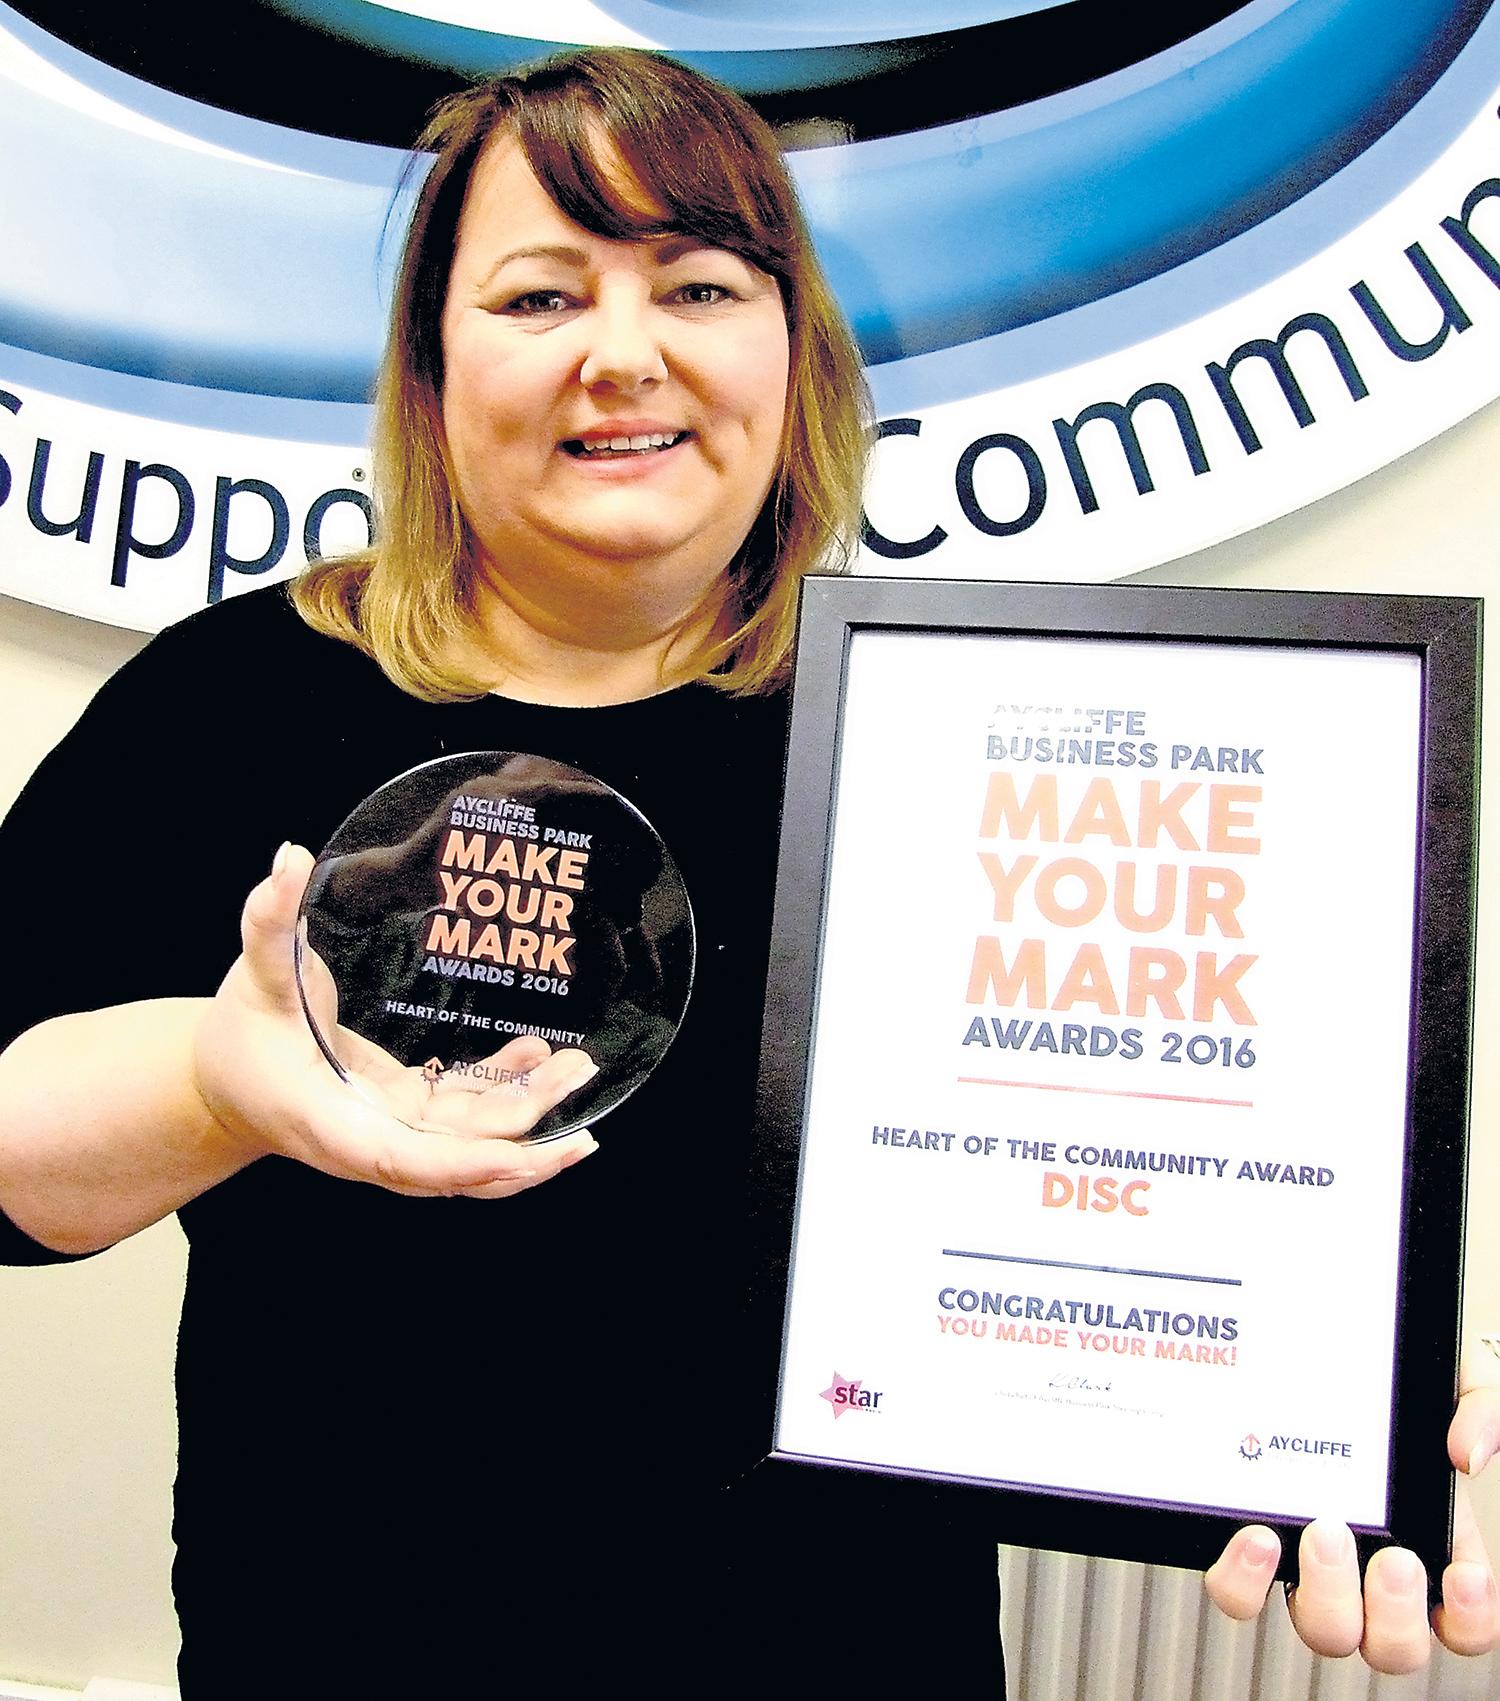 DISC Win Heart of Community Award